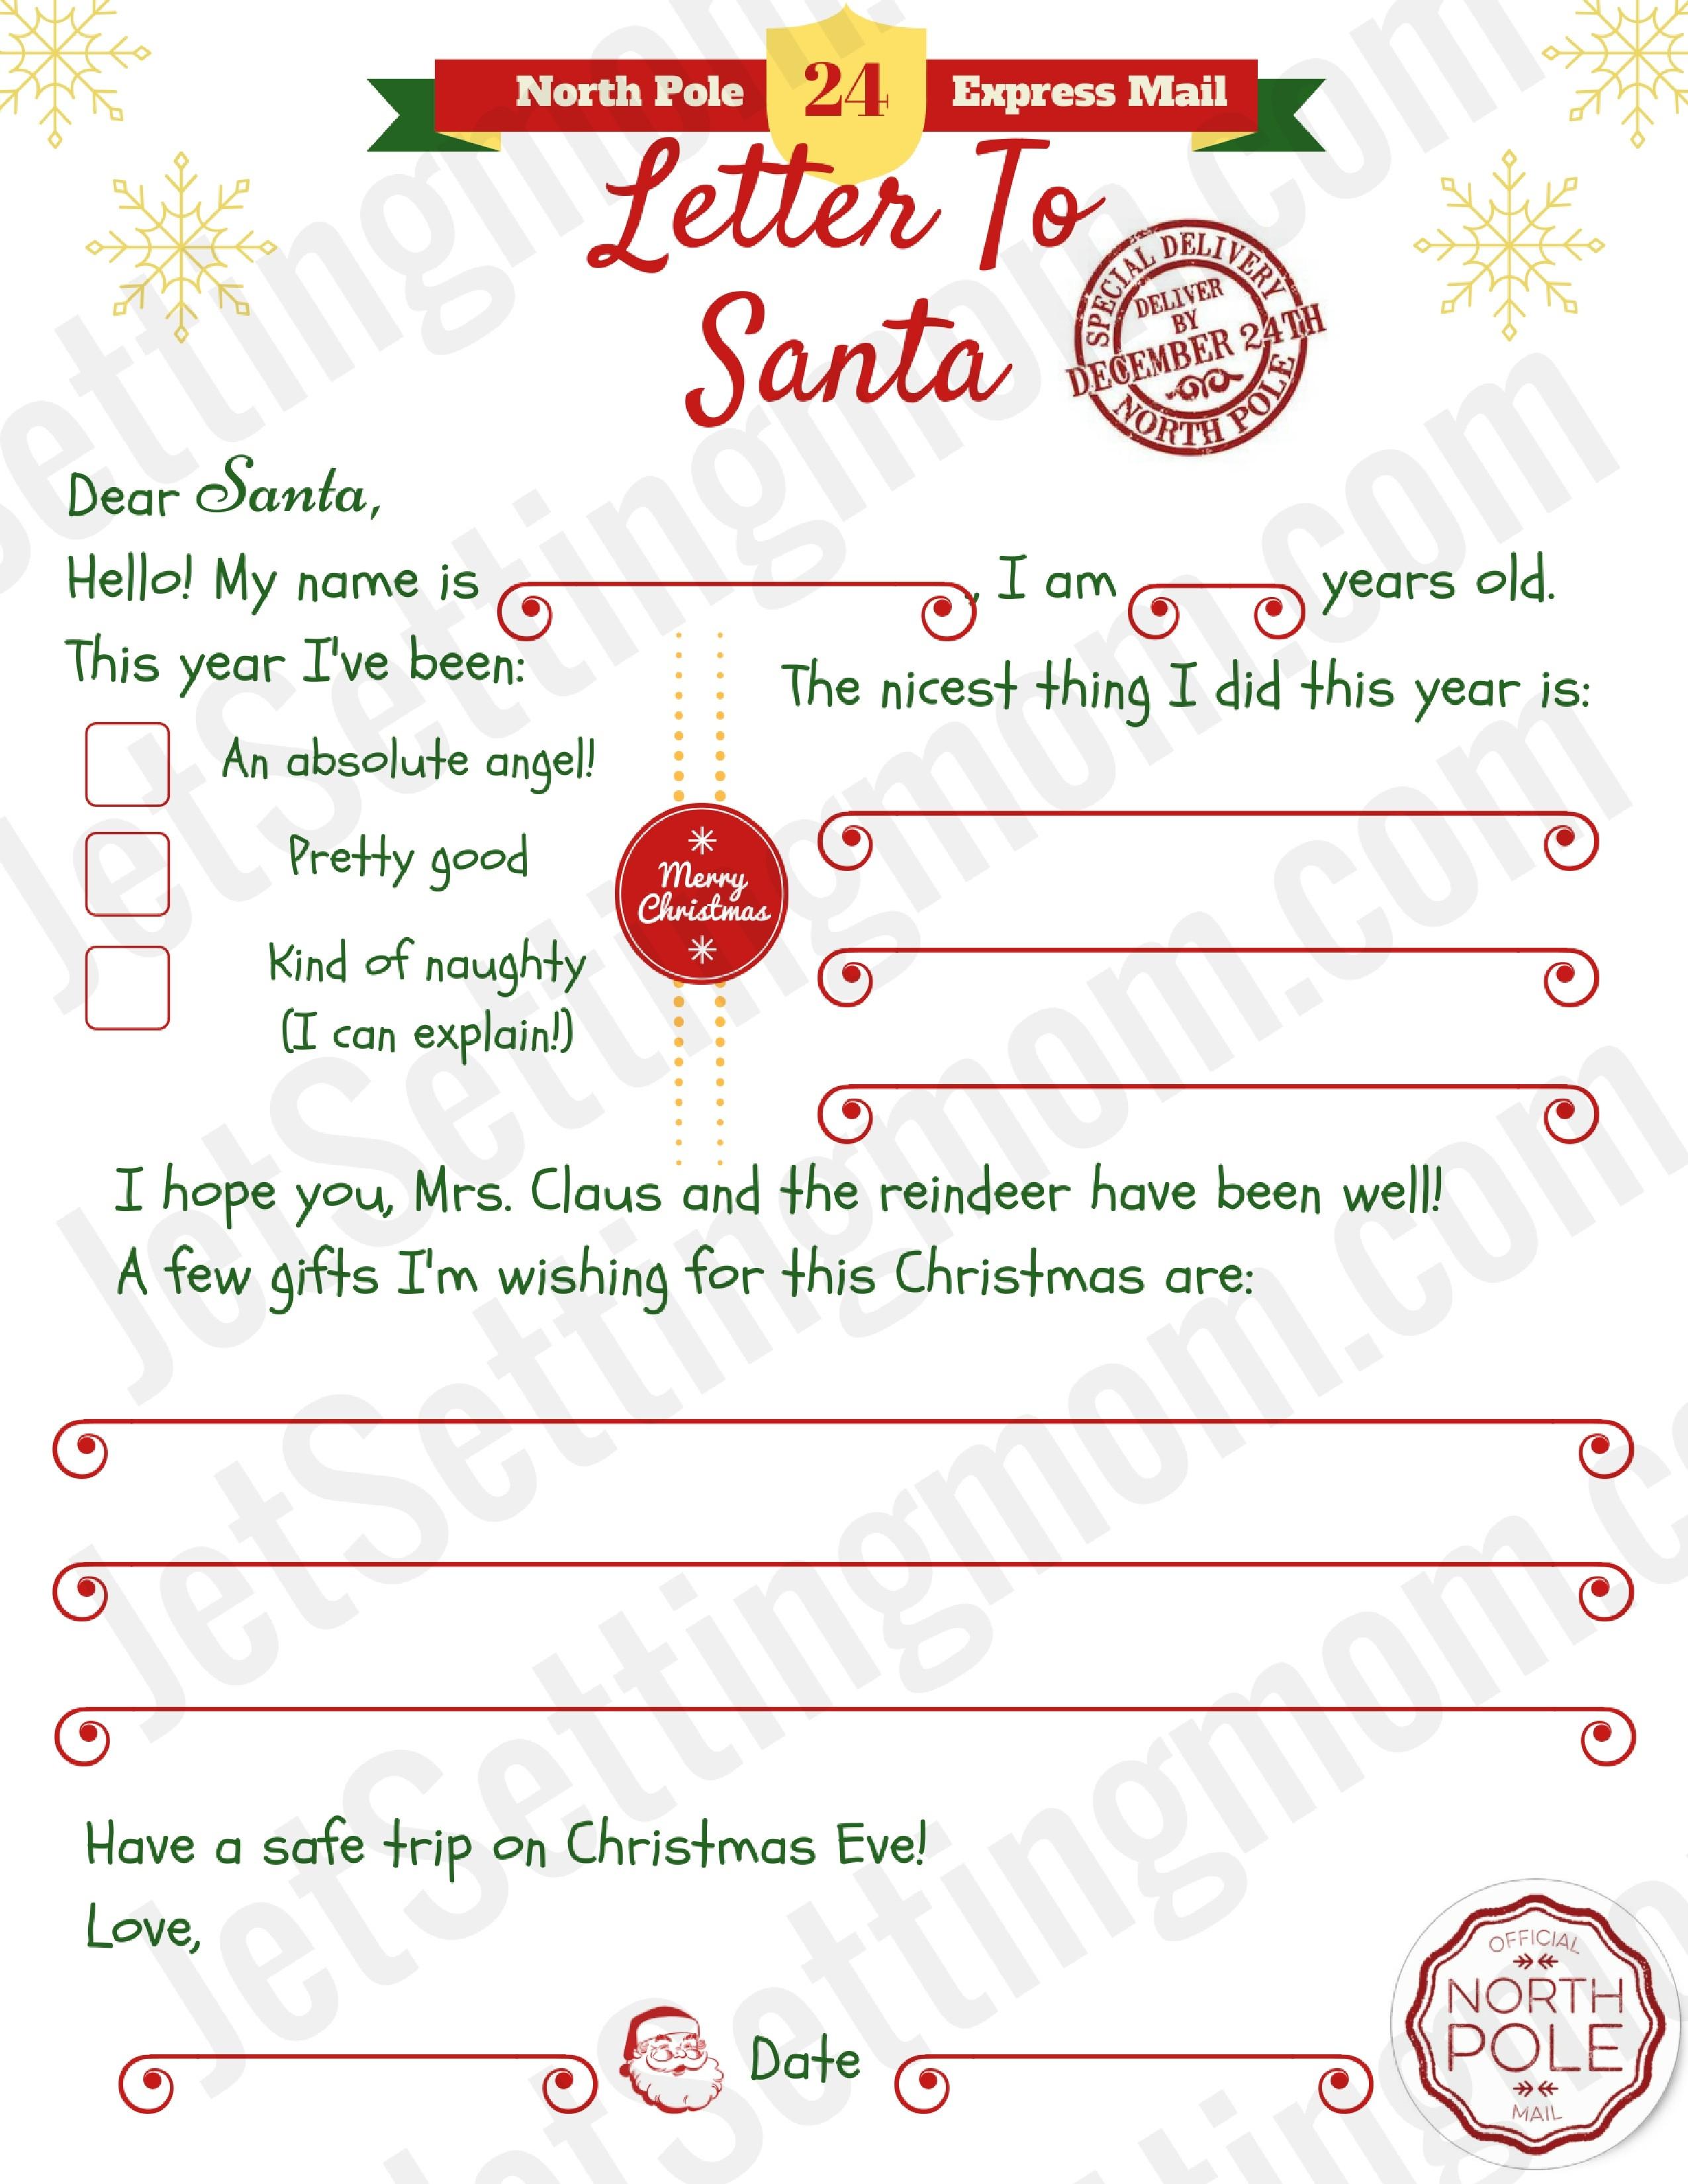 Dear Santa Letter Template Printable Best Printable Letter To Santa - Free Printable Letter From Santa Template